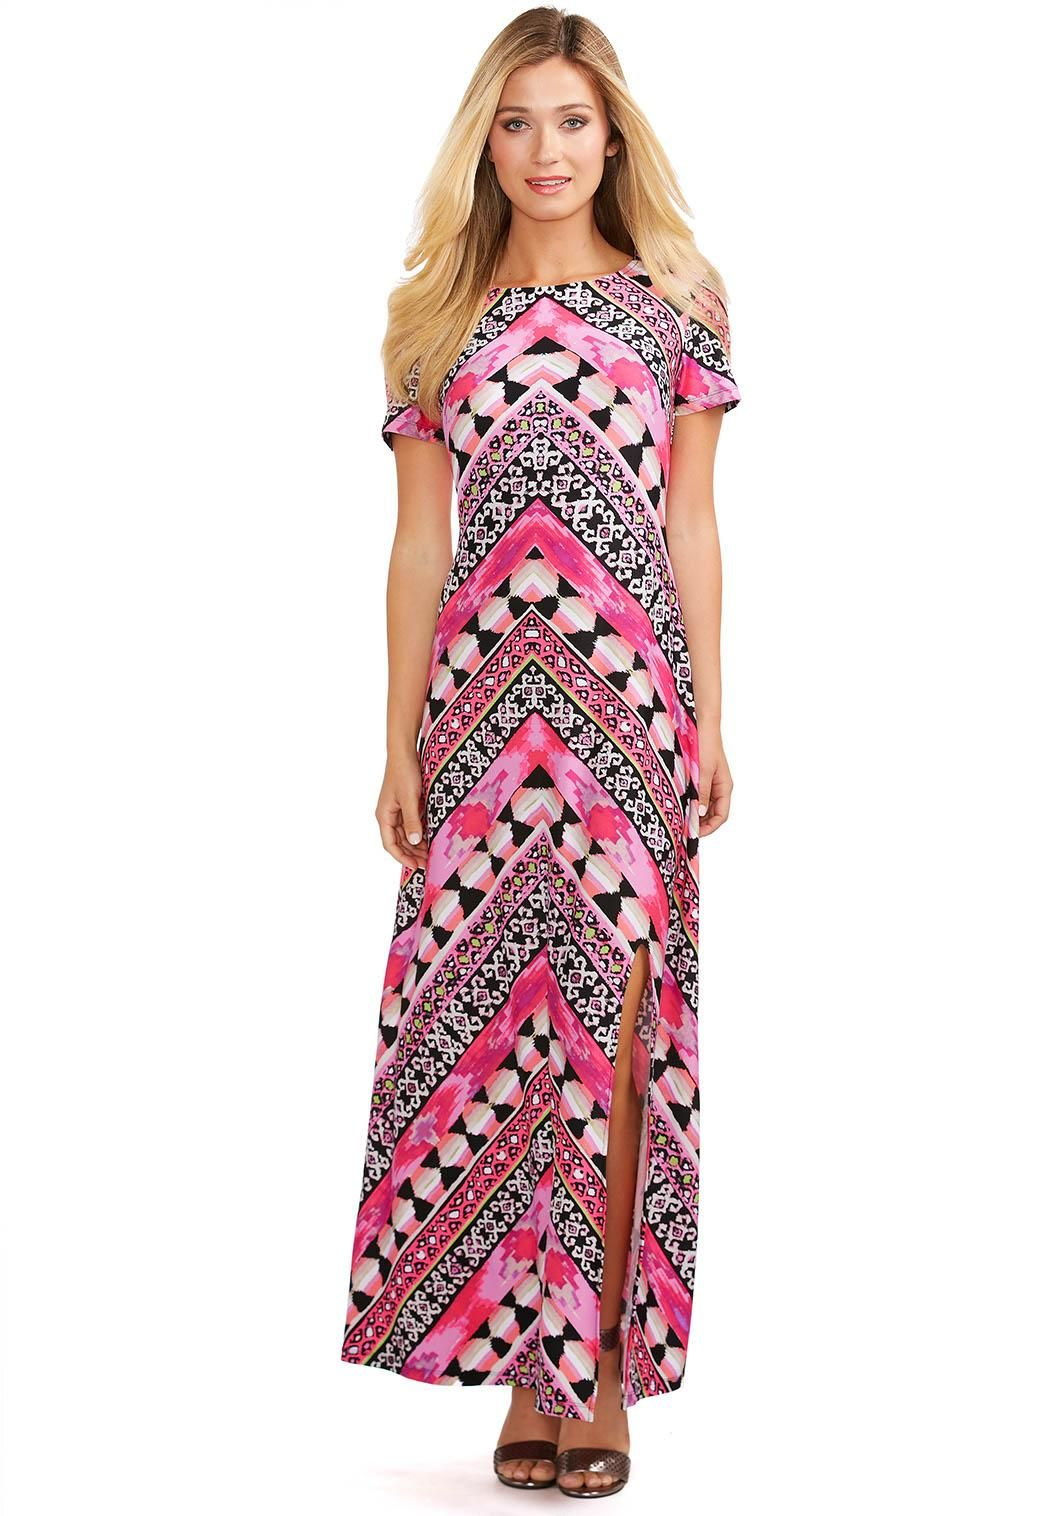 e9acba5eef0 Mixed Print Maxi Dress-Petite Dresses Cato Fashions